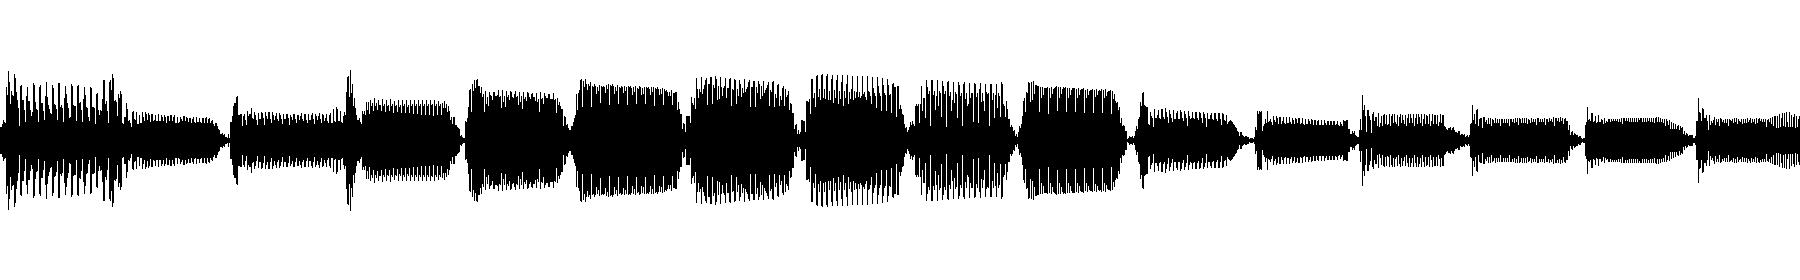 blbc jazzyripper 110 c